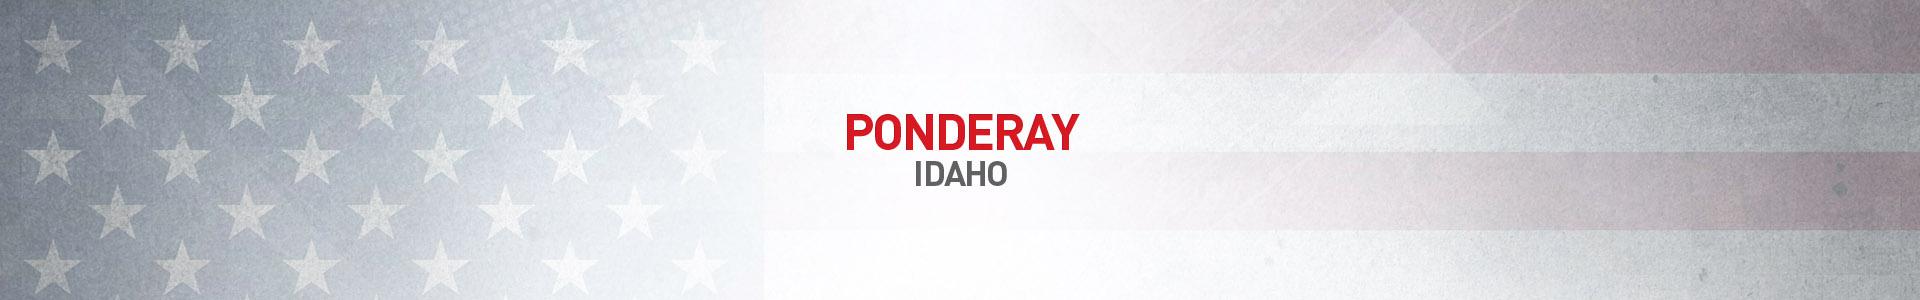 Topo-Cidades-Ponderay-SBA